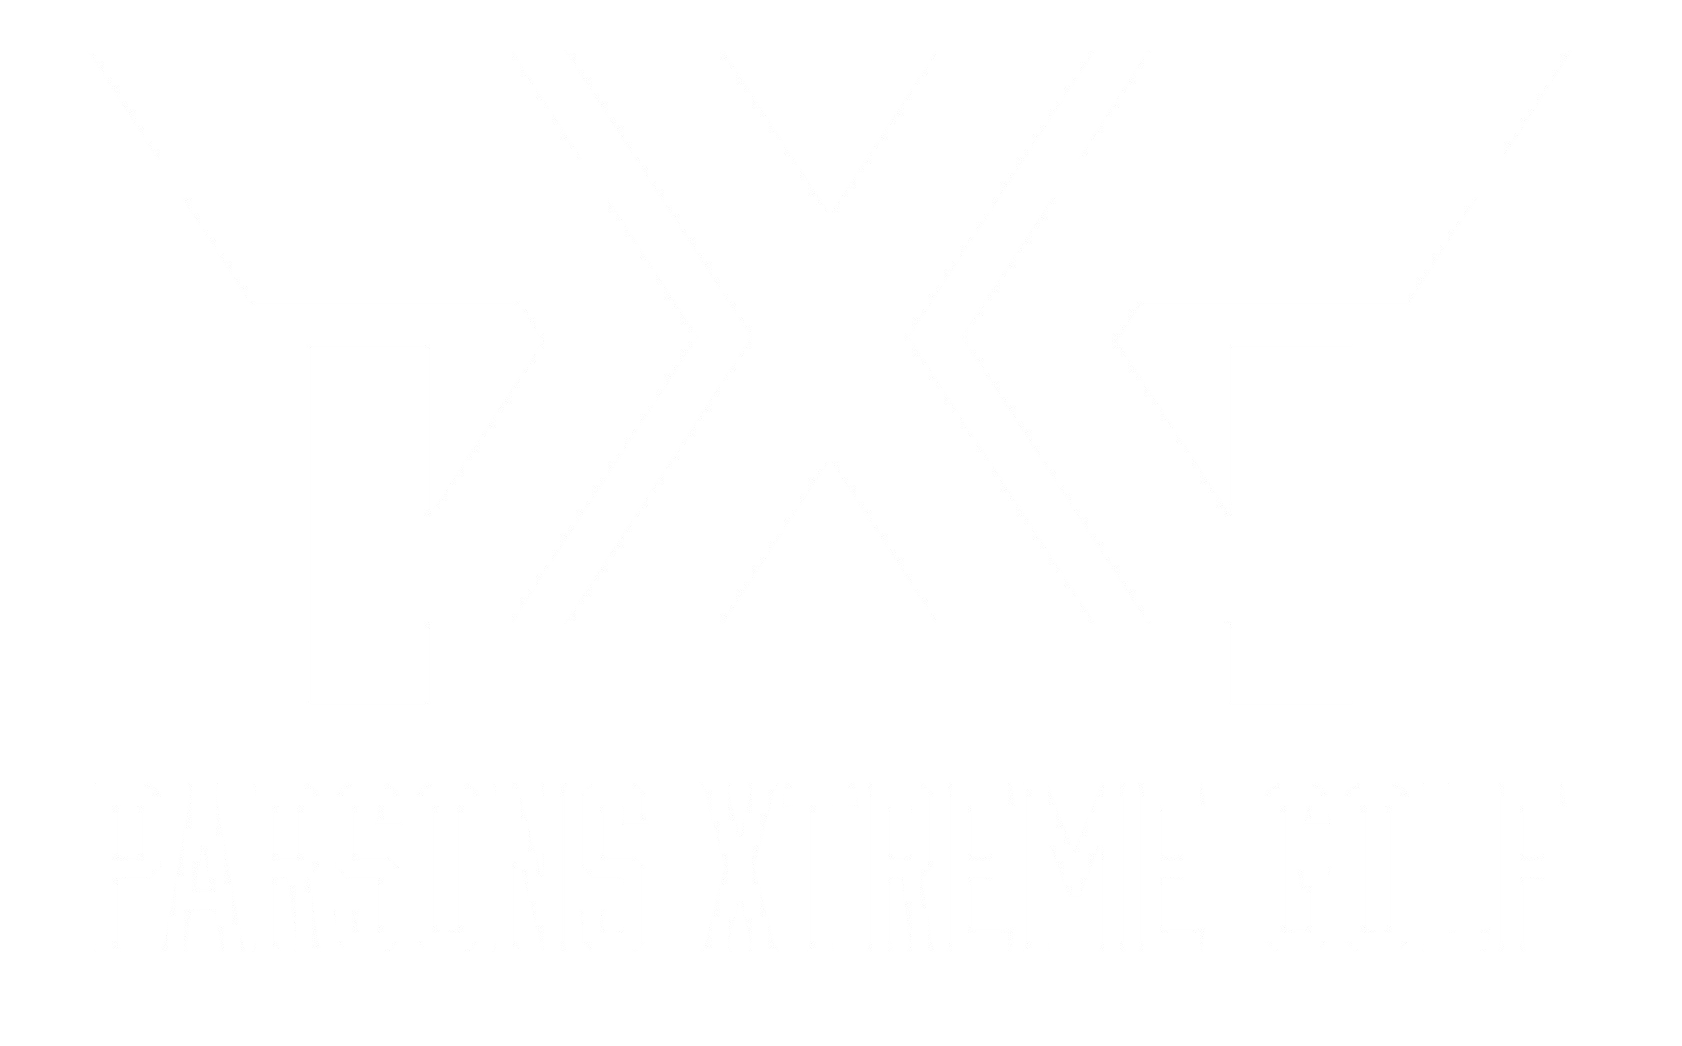 PXG-Parsons-Xtreme-Golf-White-Black-Stretch-Logo-1-JPEG.png